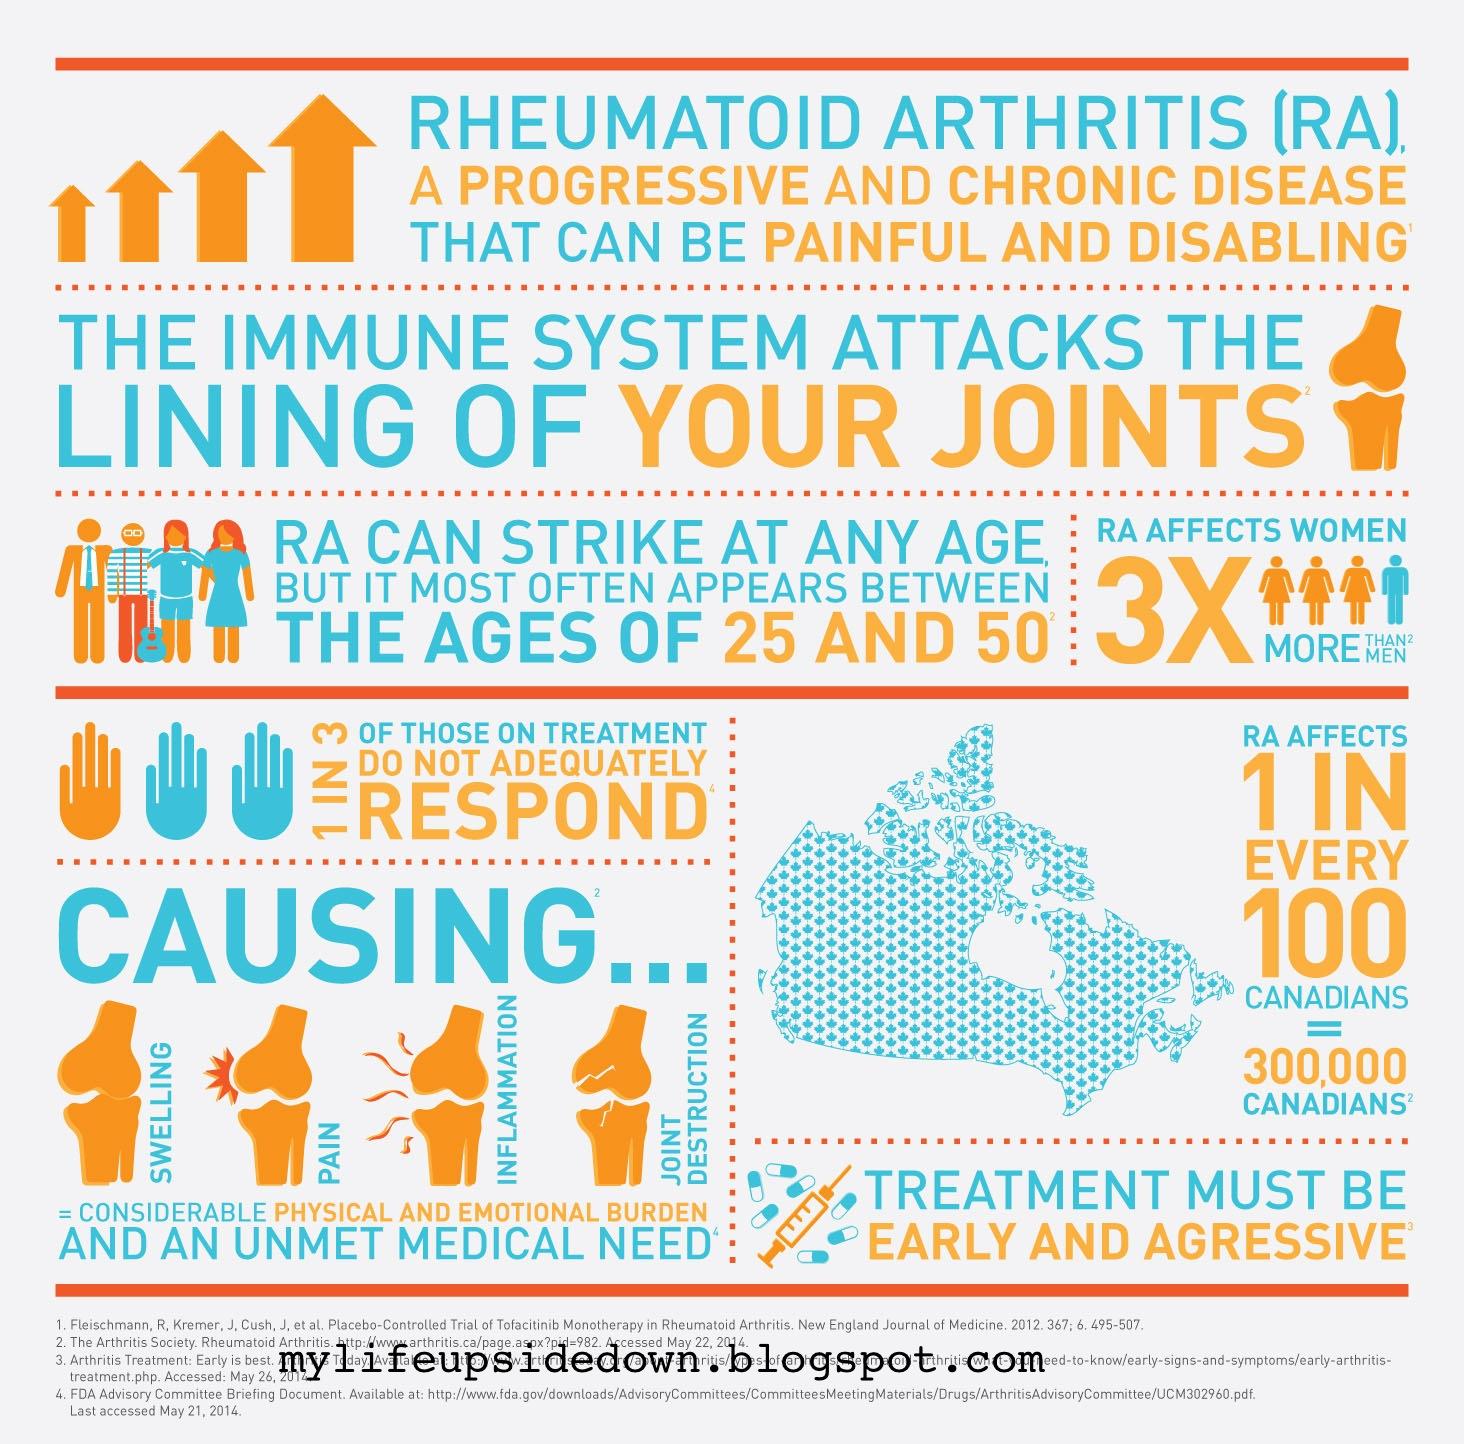 Patrick eshun reviewing arthritis rheumatoid thesis nursing essay